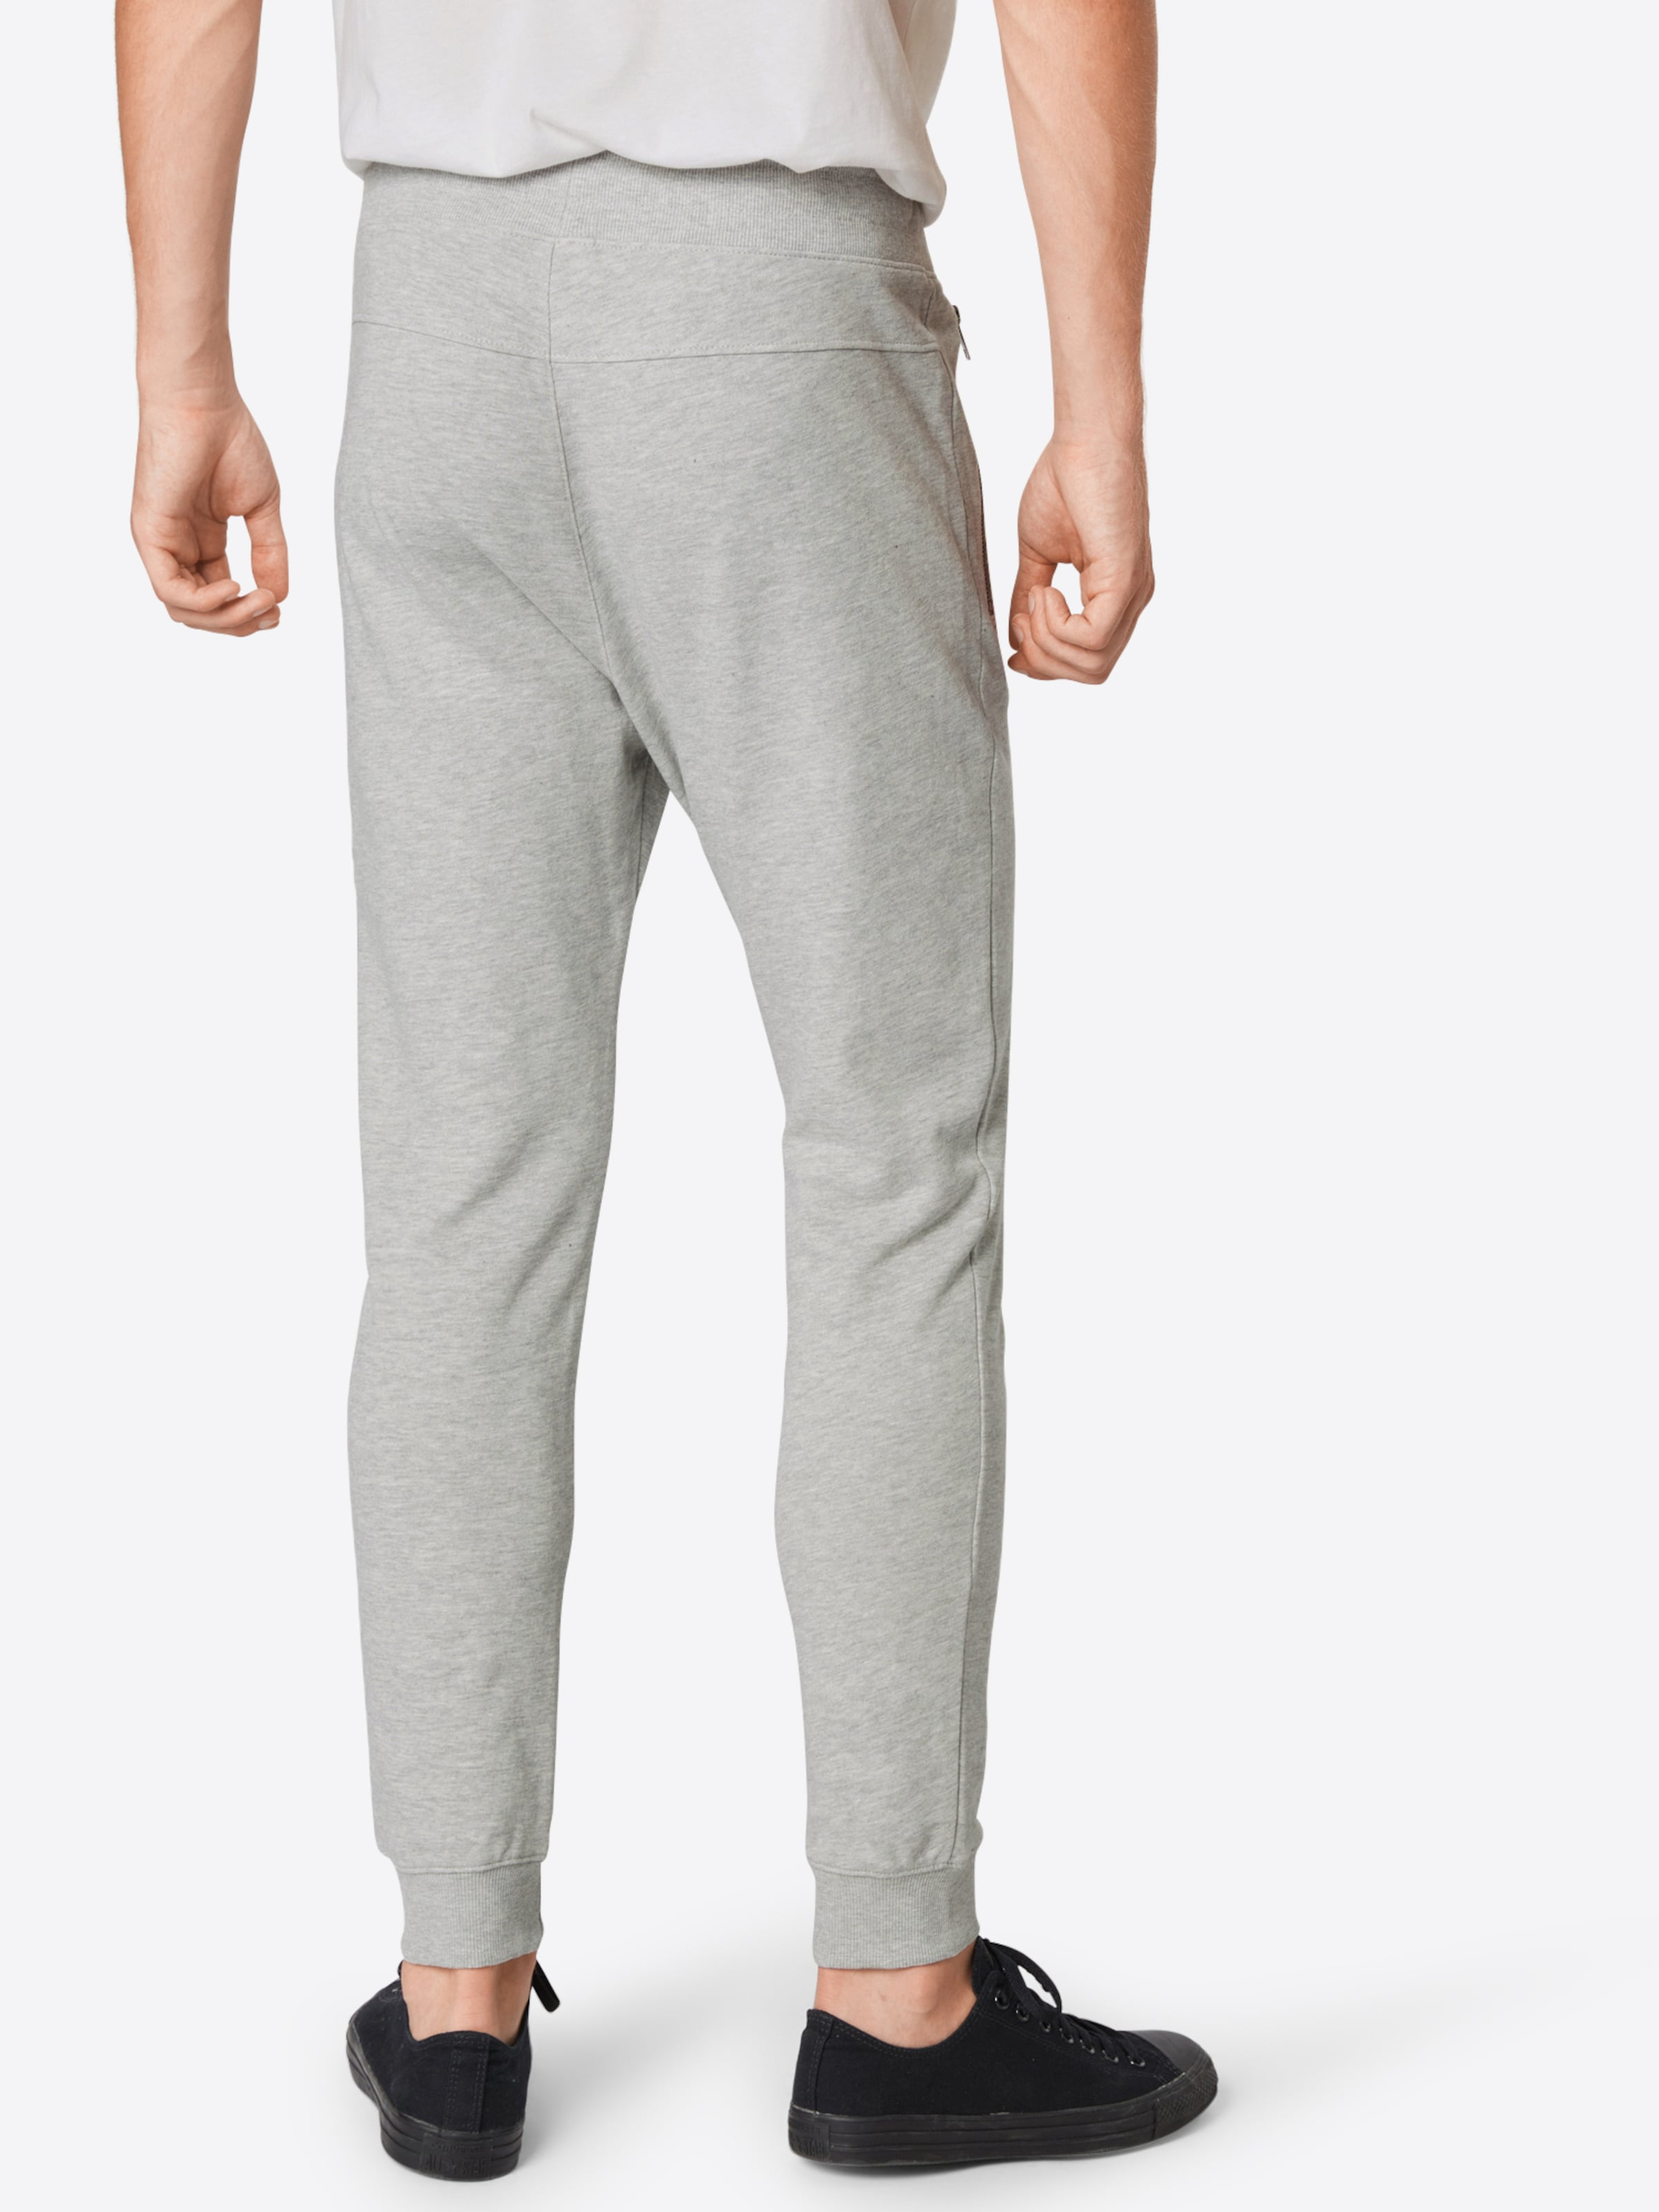 En Pantalon Tom Denim Gris Tailor txQsBhdrC